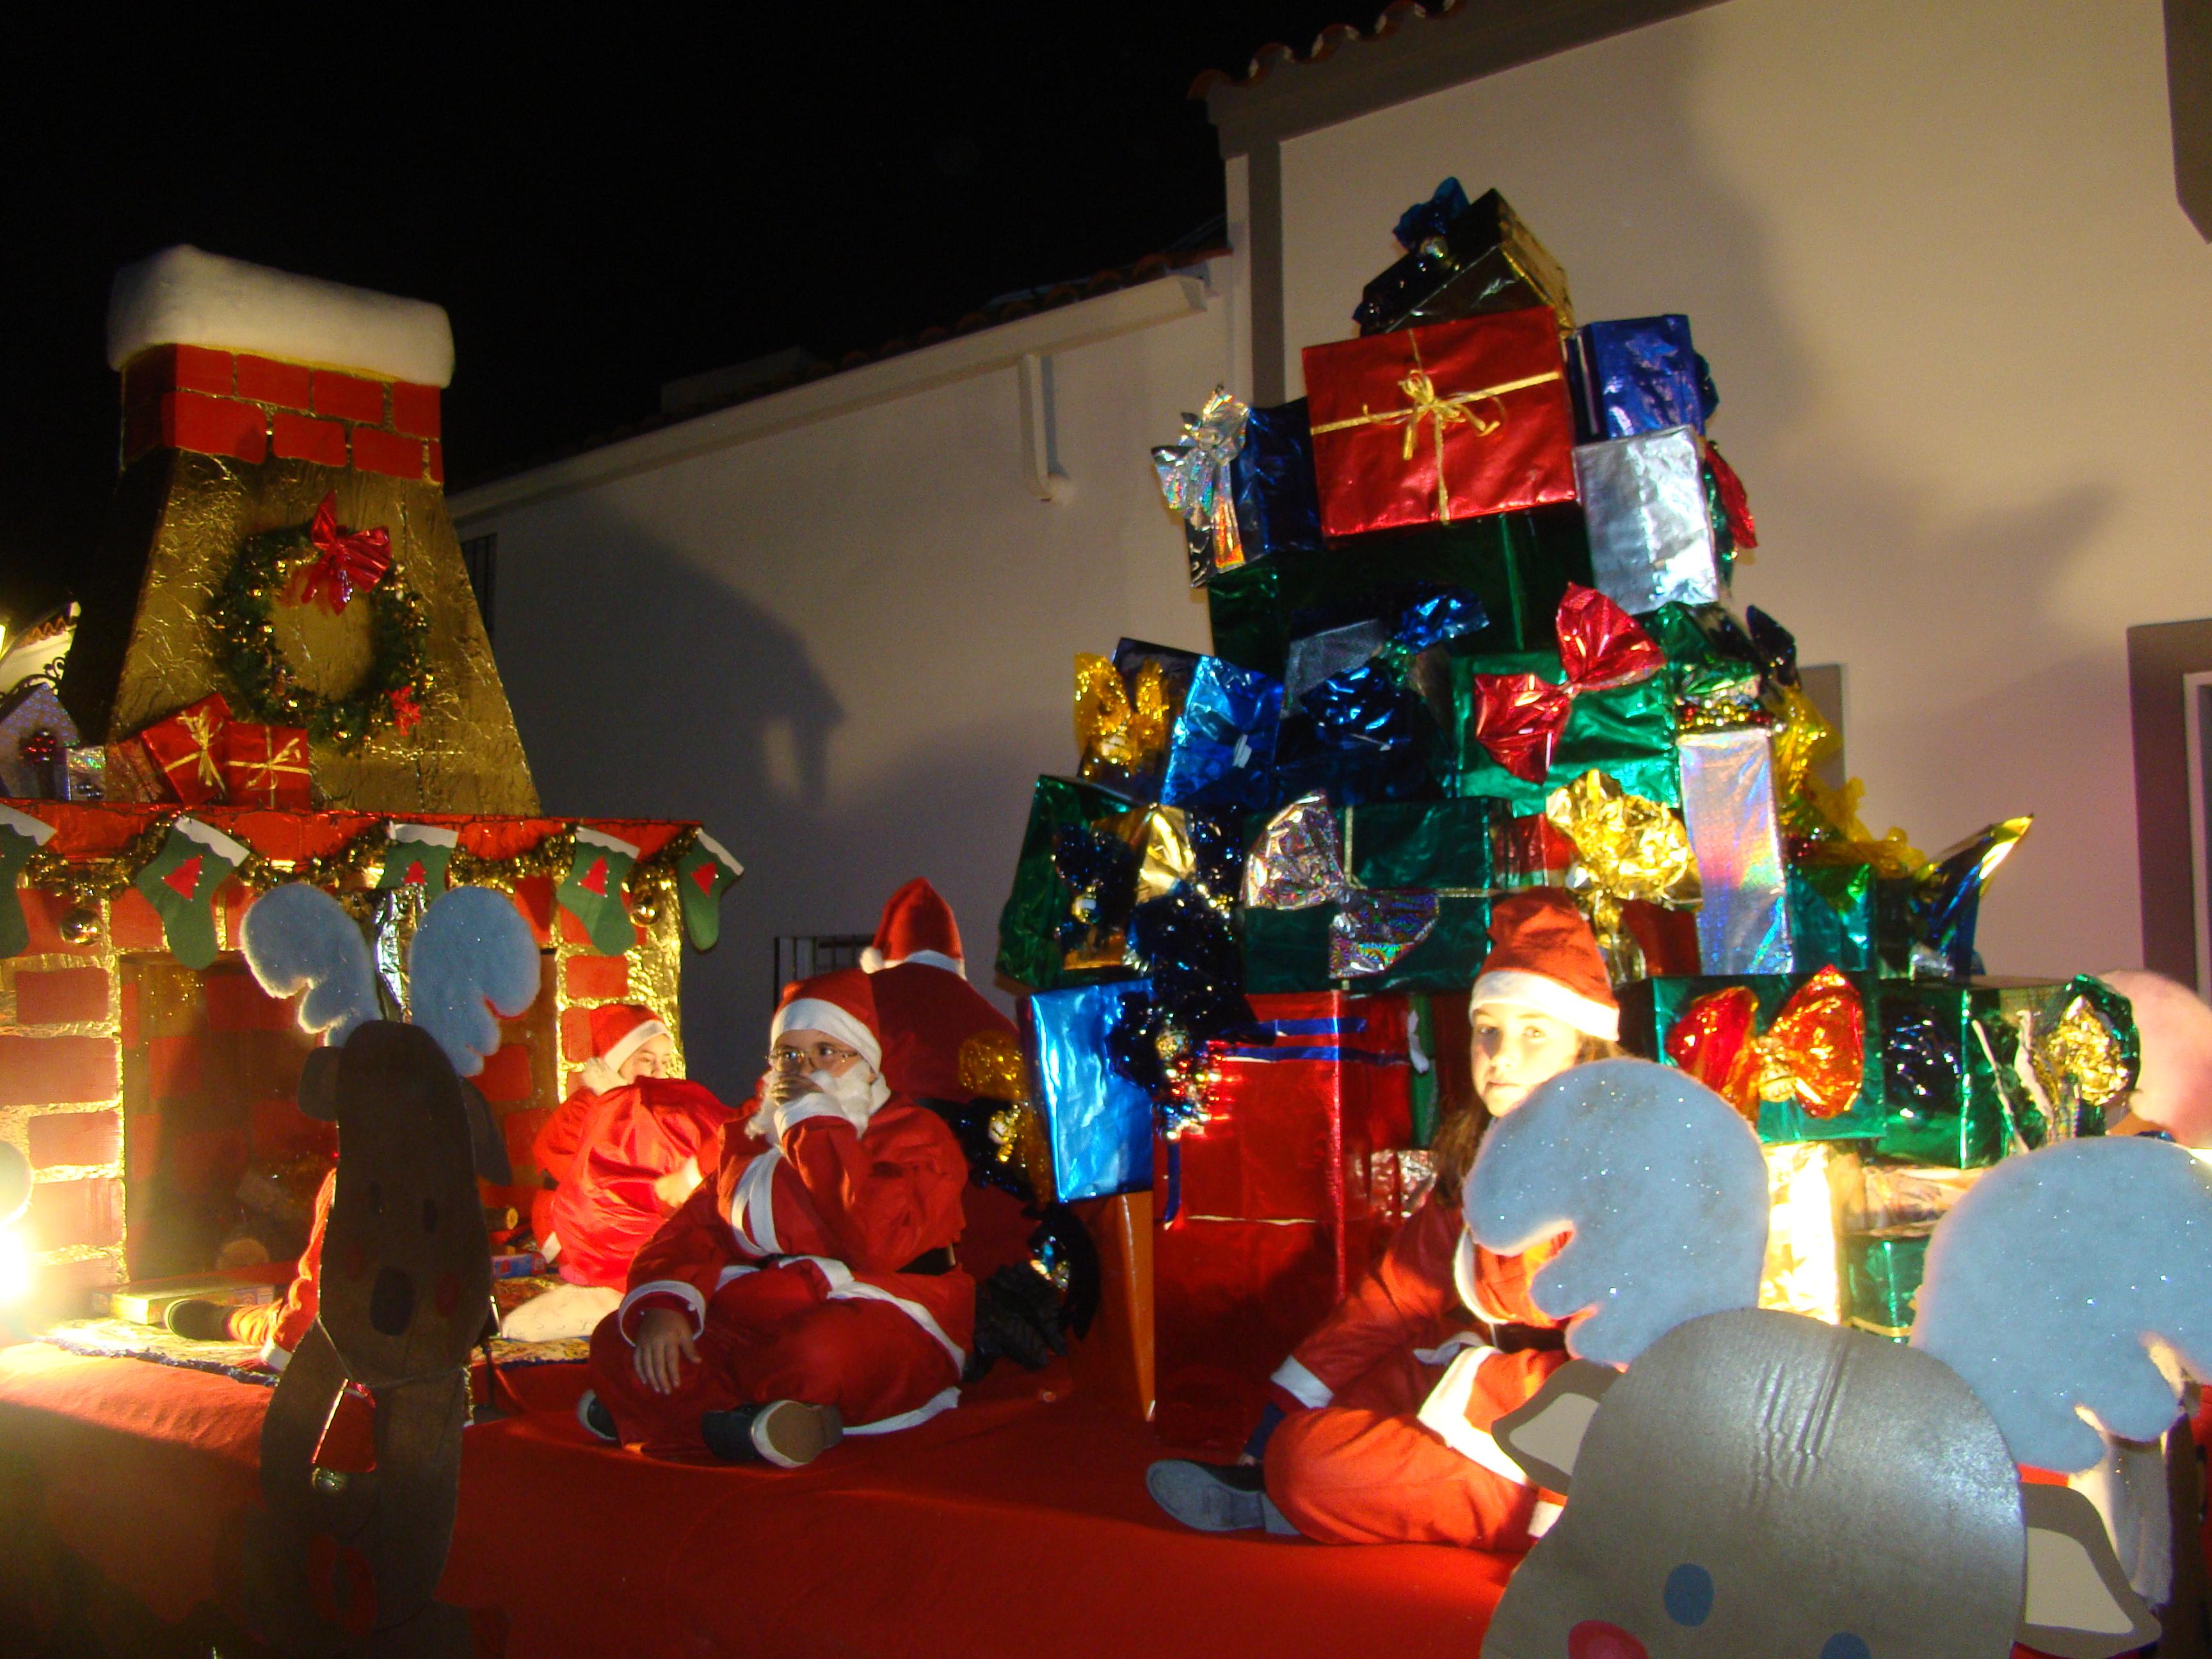 CABALGATA DE REYES 2014 EN HIGUERA LA REAL